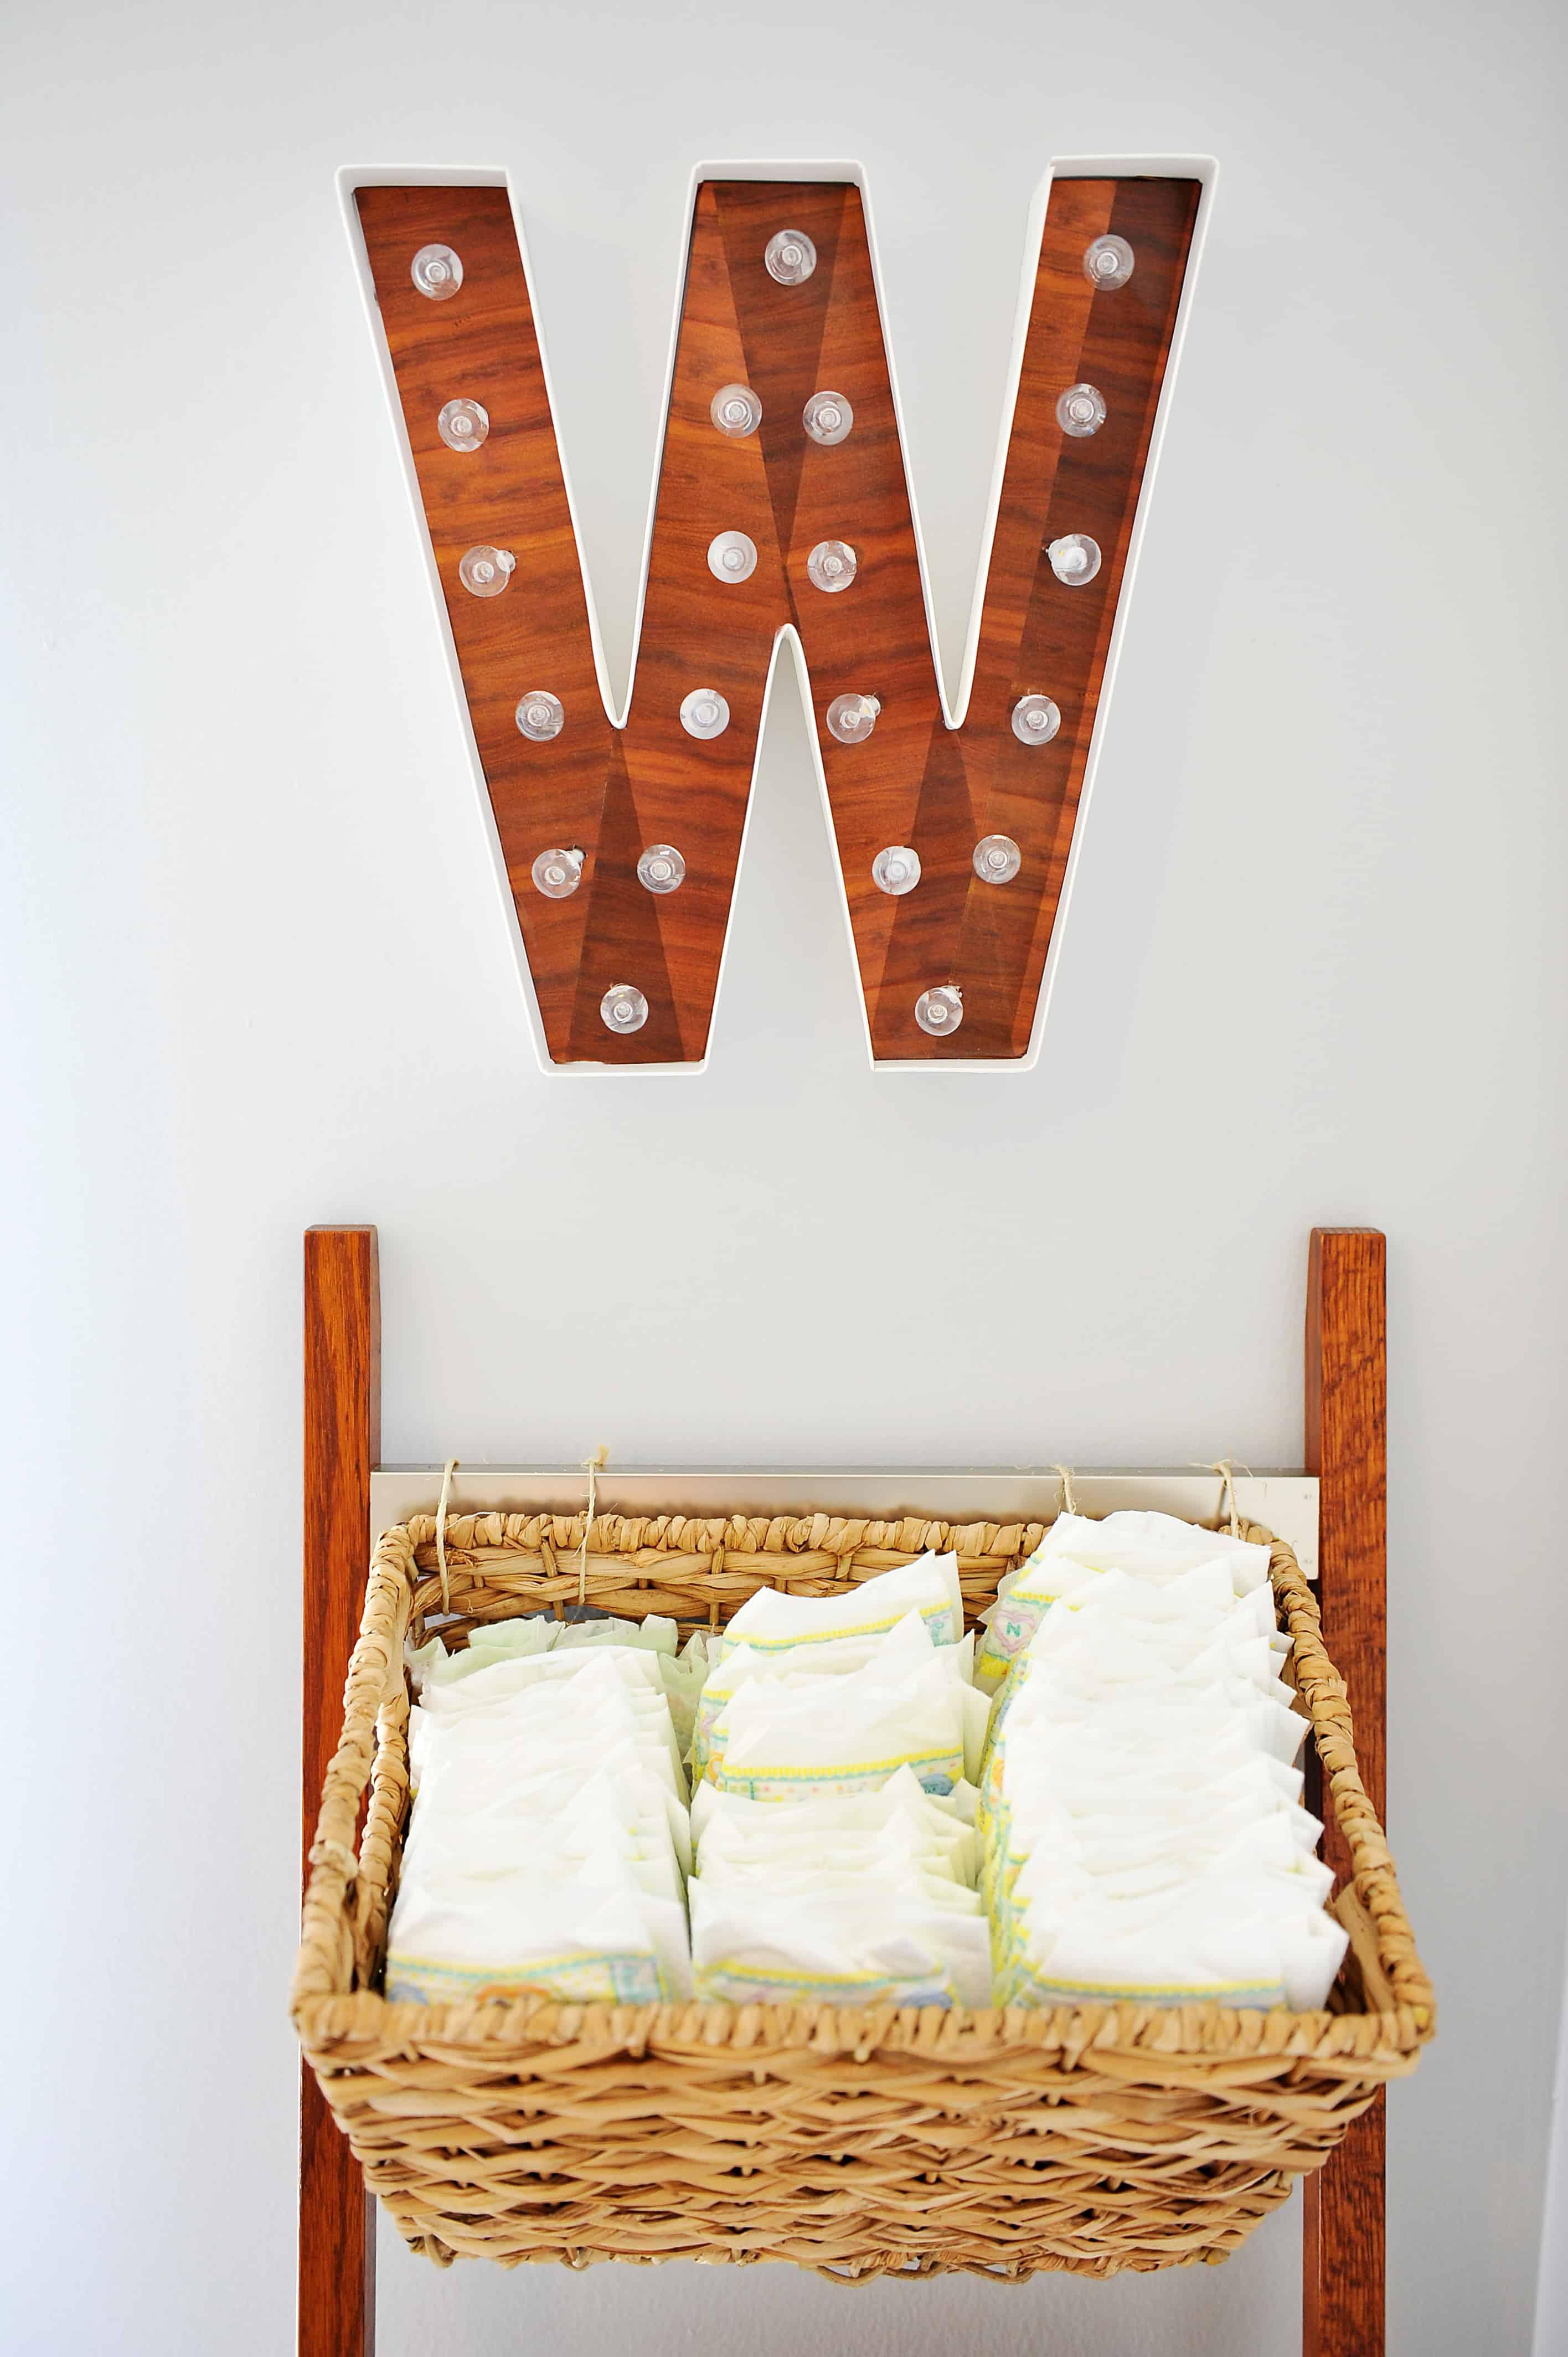 W marque letter and diaper basket | DIY Storage Ladder